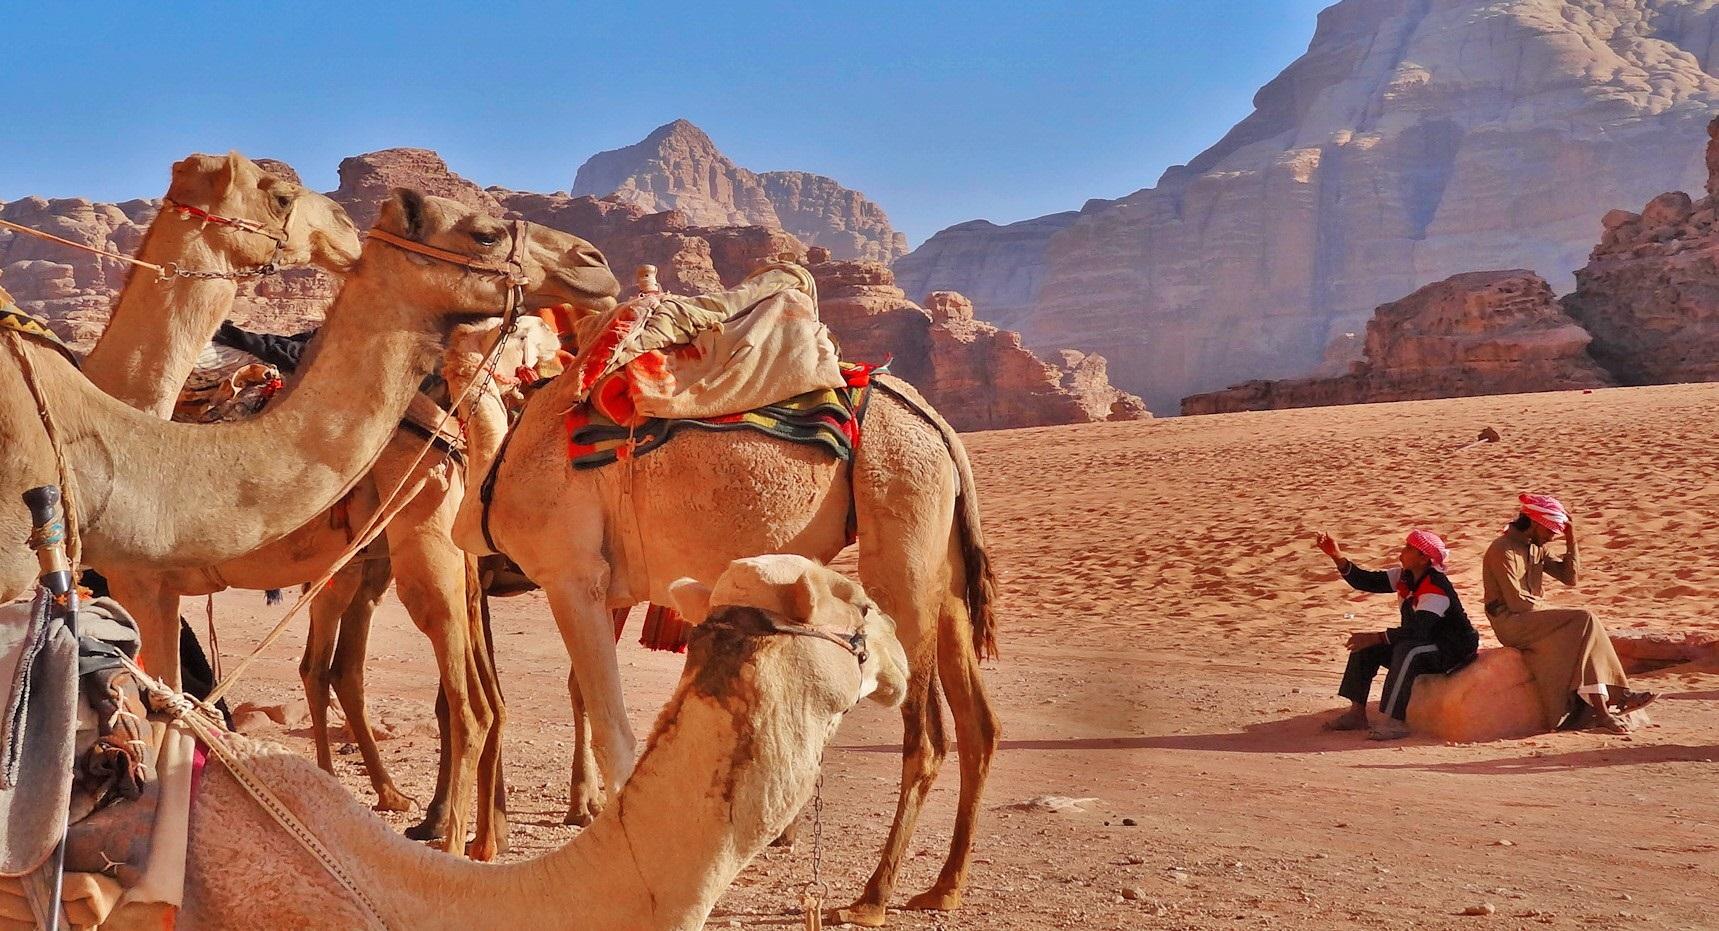 Sleeping under the stars in Wadi Rum!